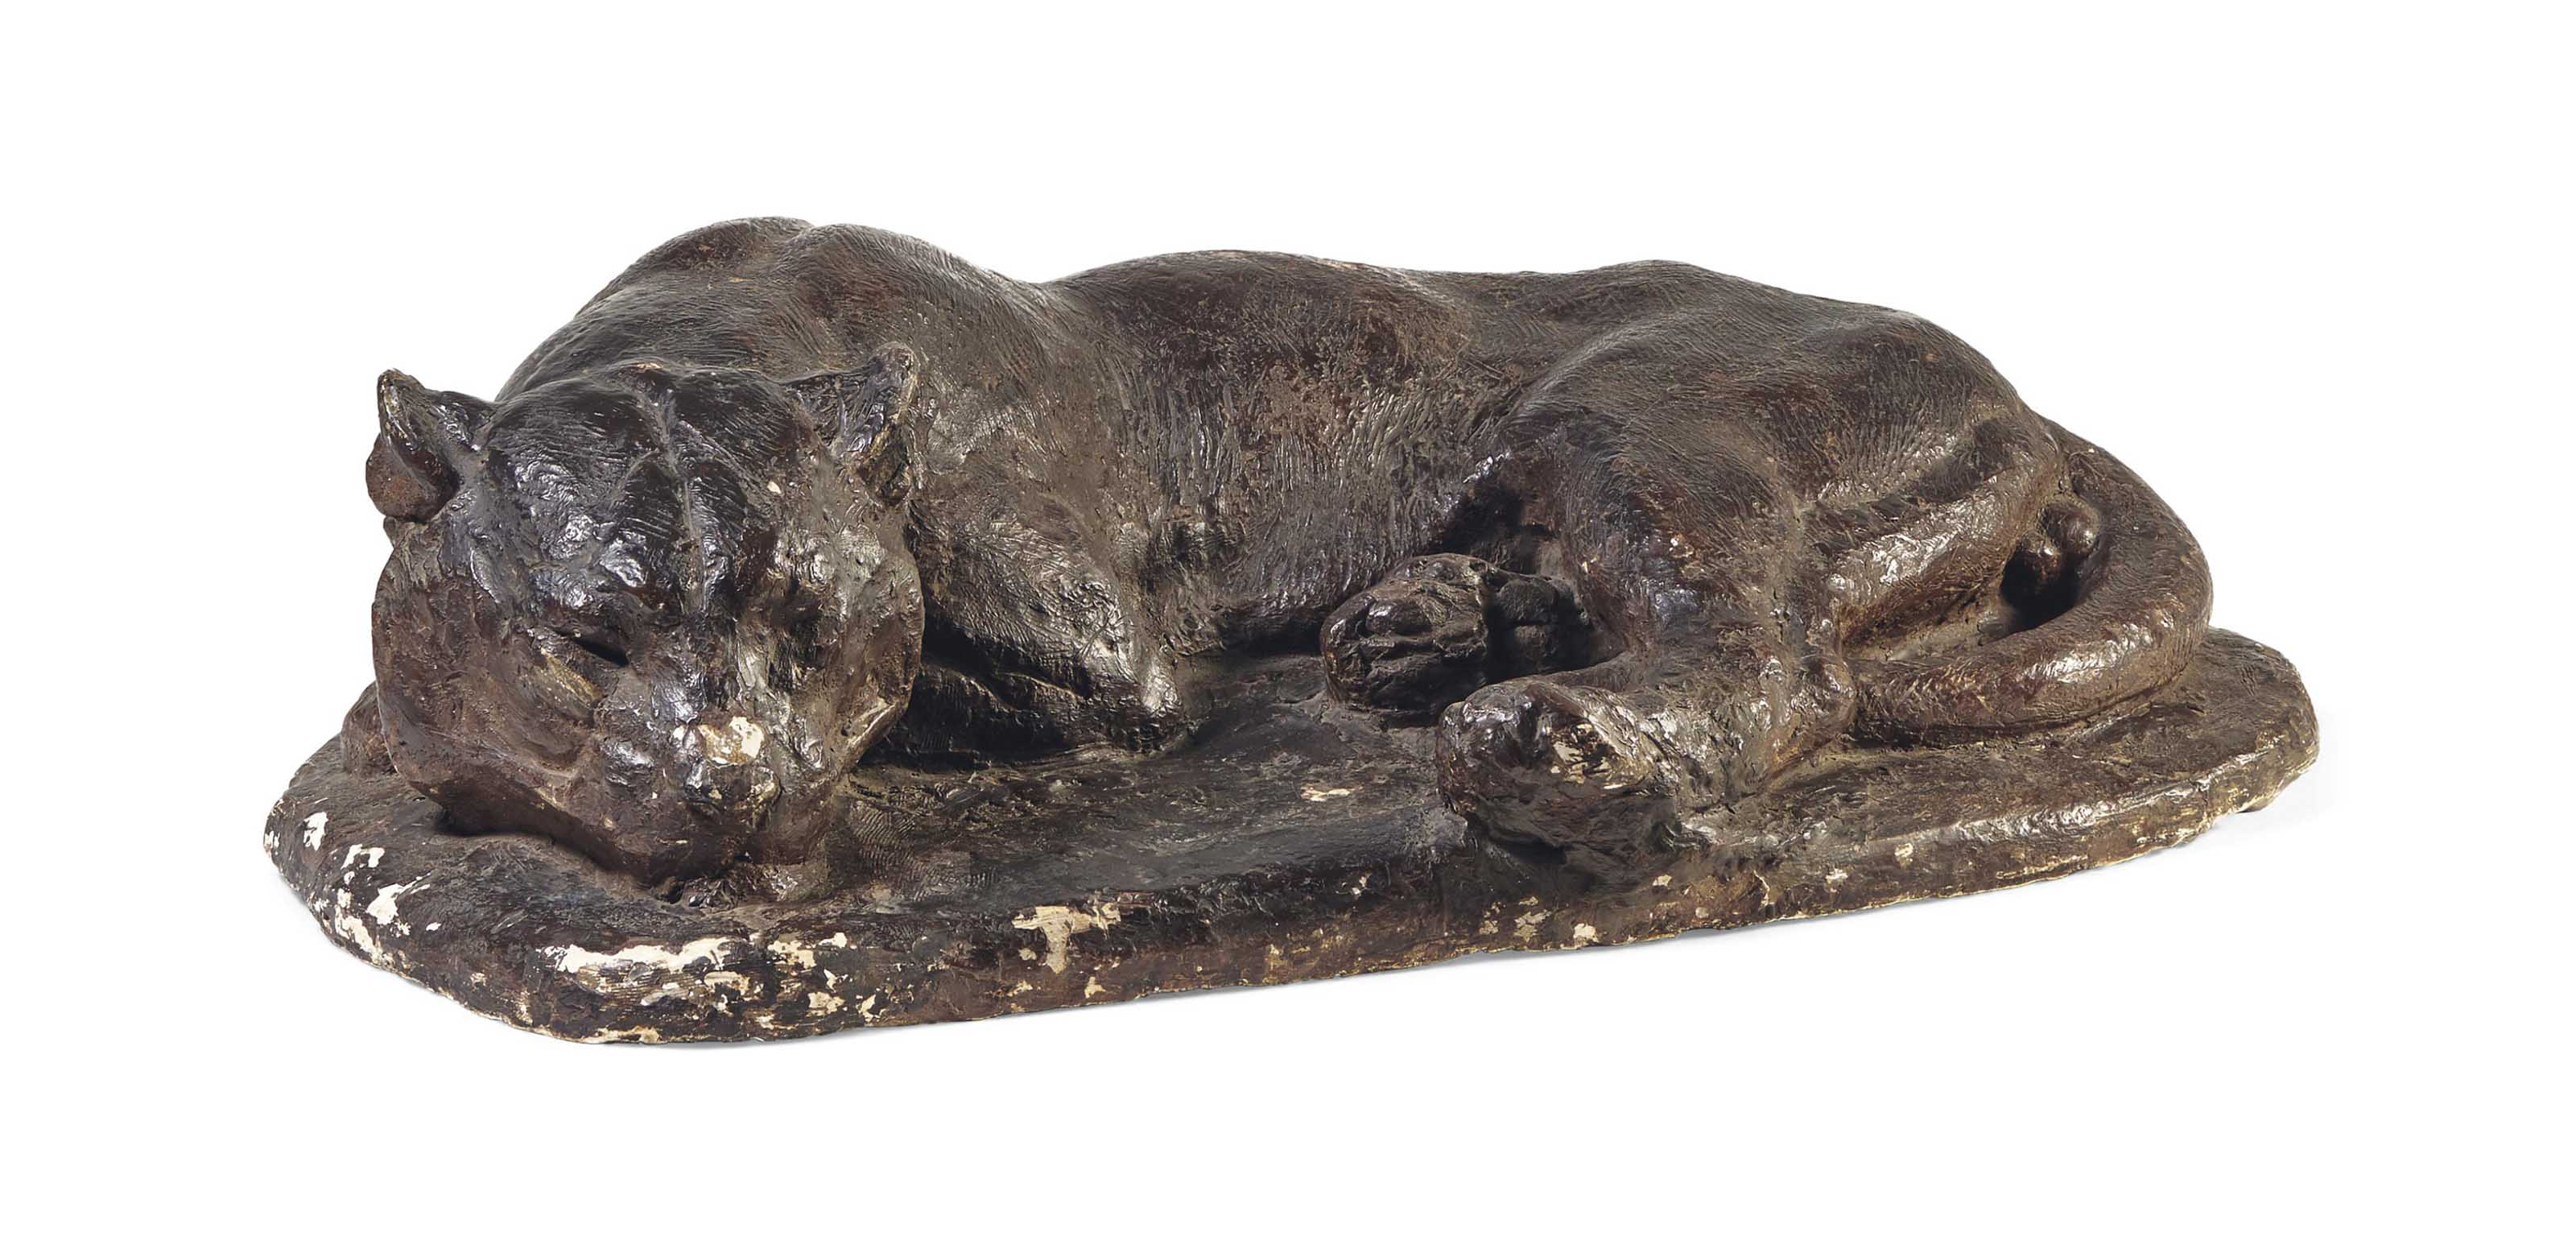 Jaguar dormant (Jaguar sleeping)